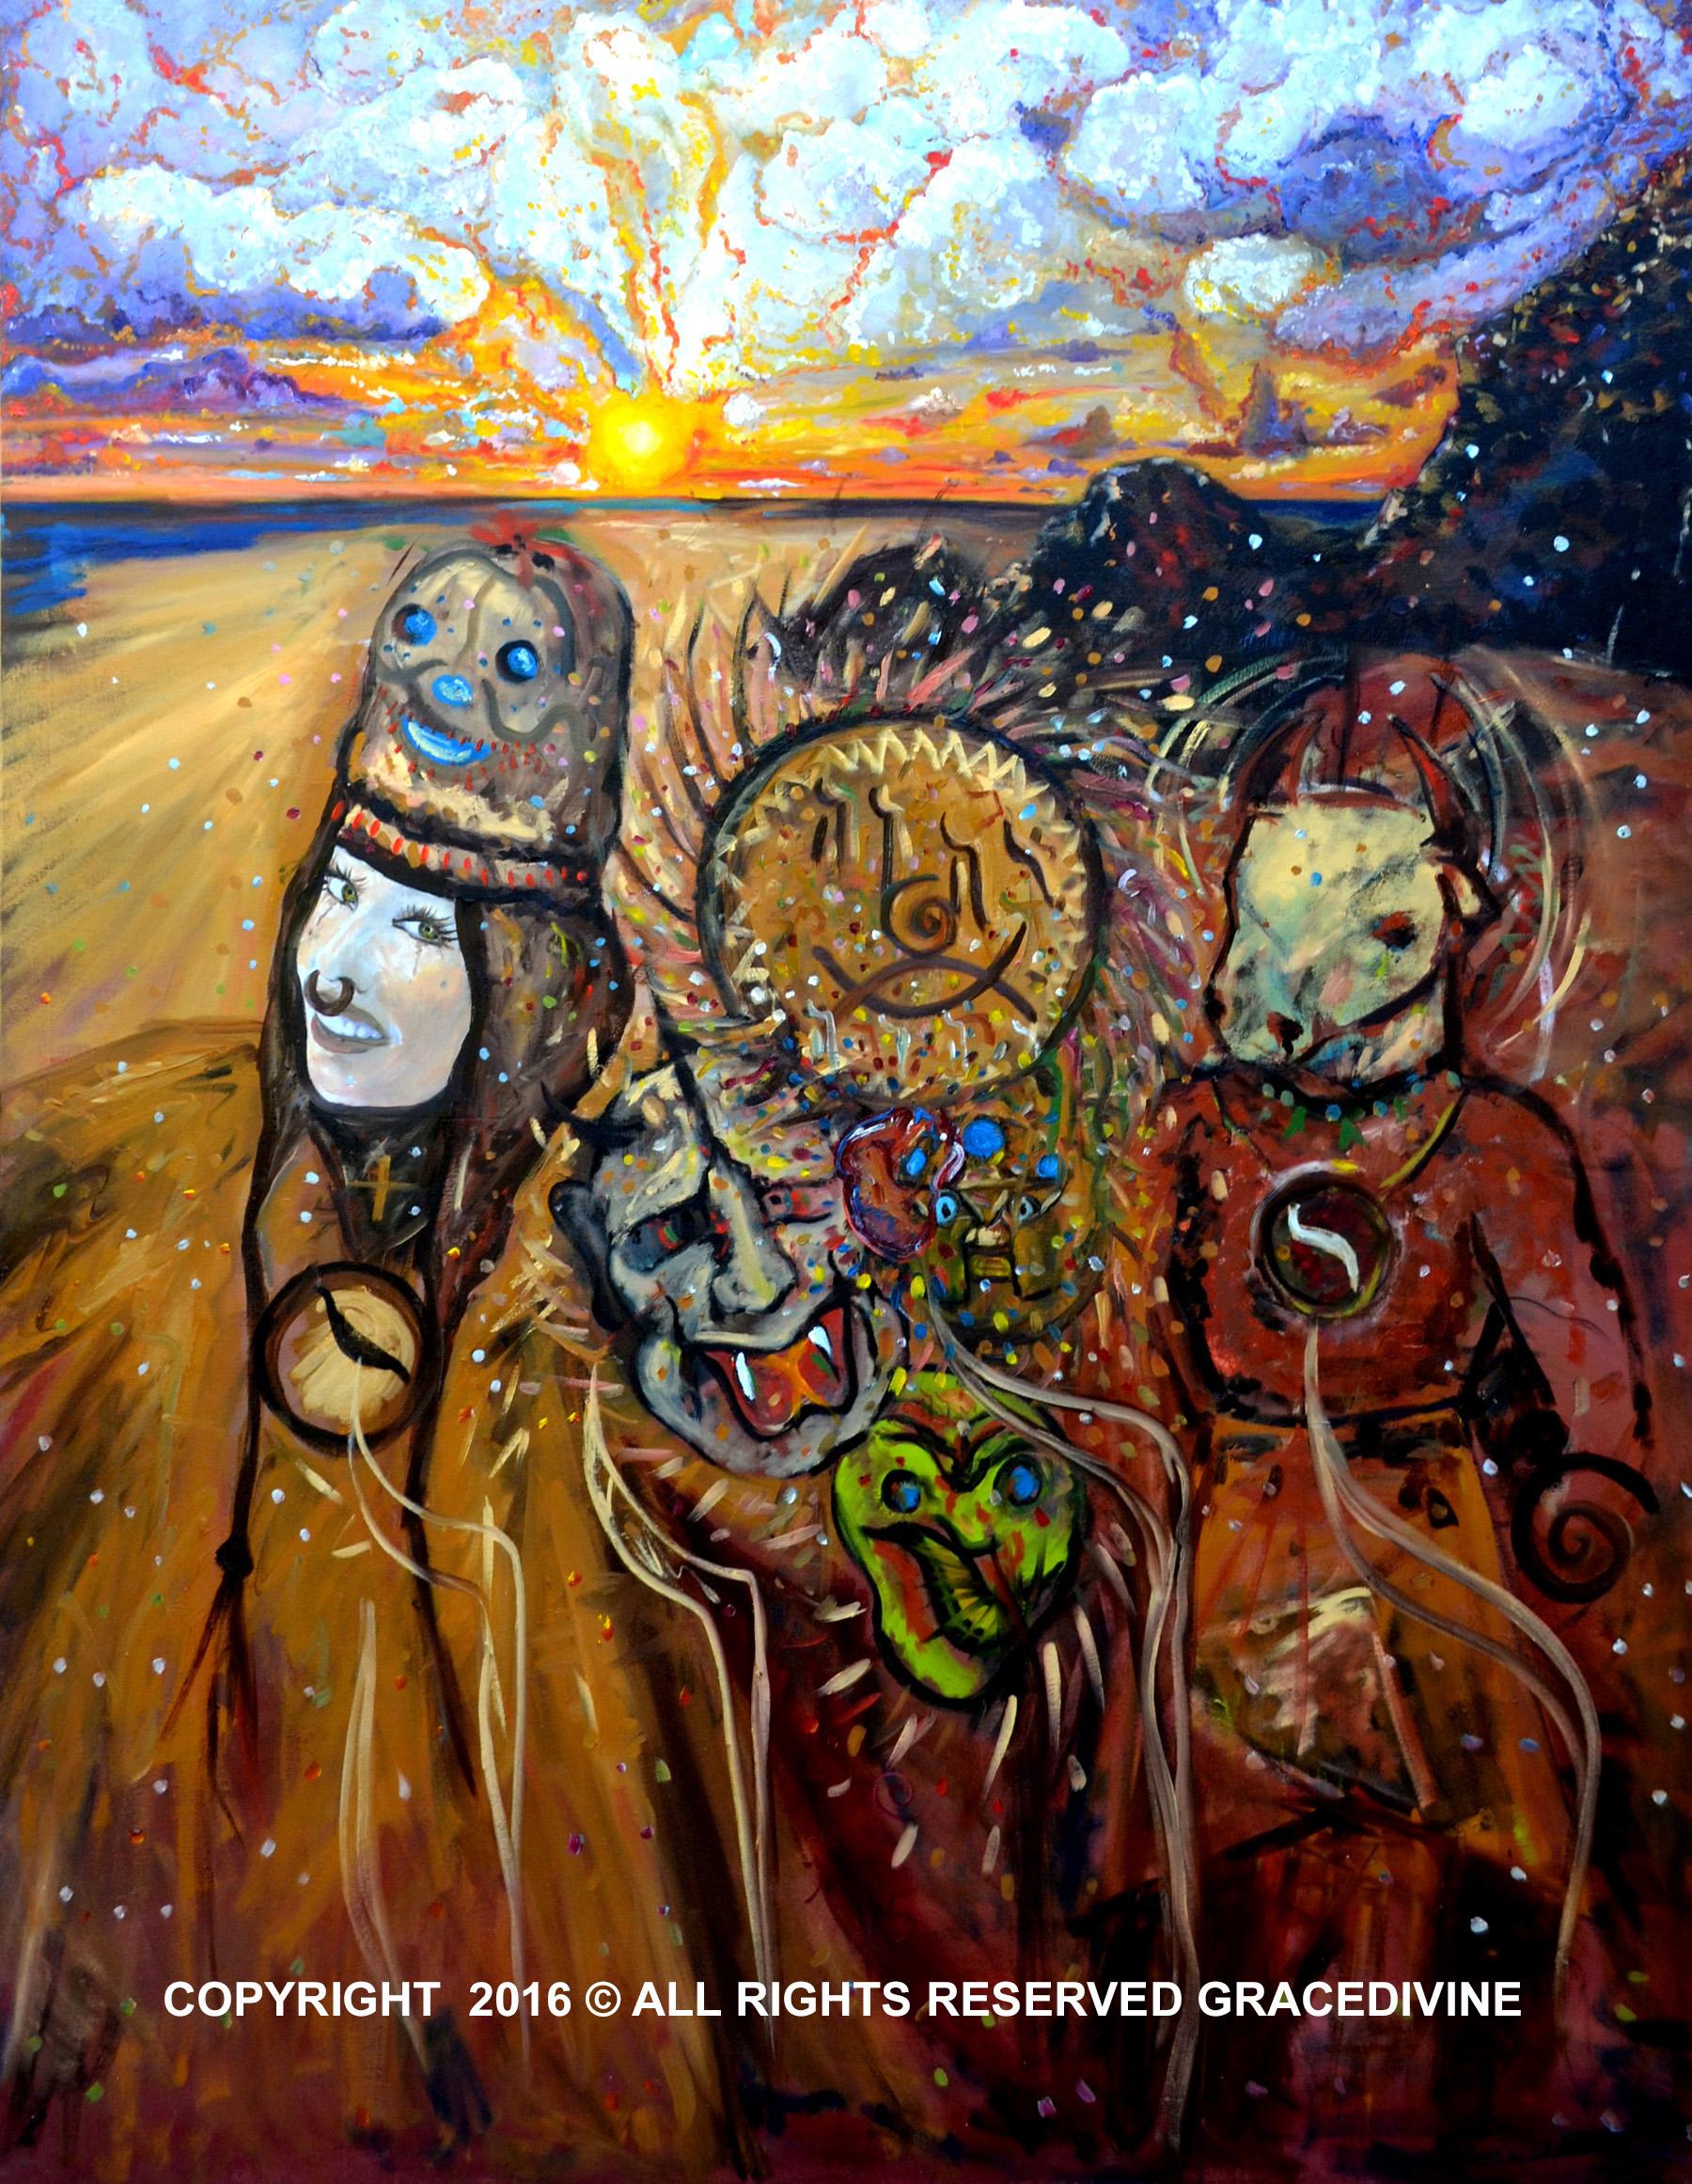 shaman, art, shamanism, symbolism, surrealism, symbol, art, judaism, native american, gracedivine